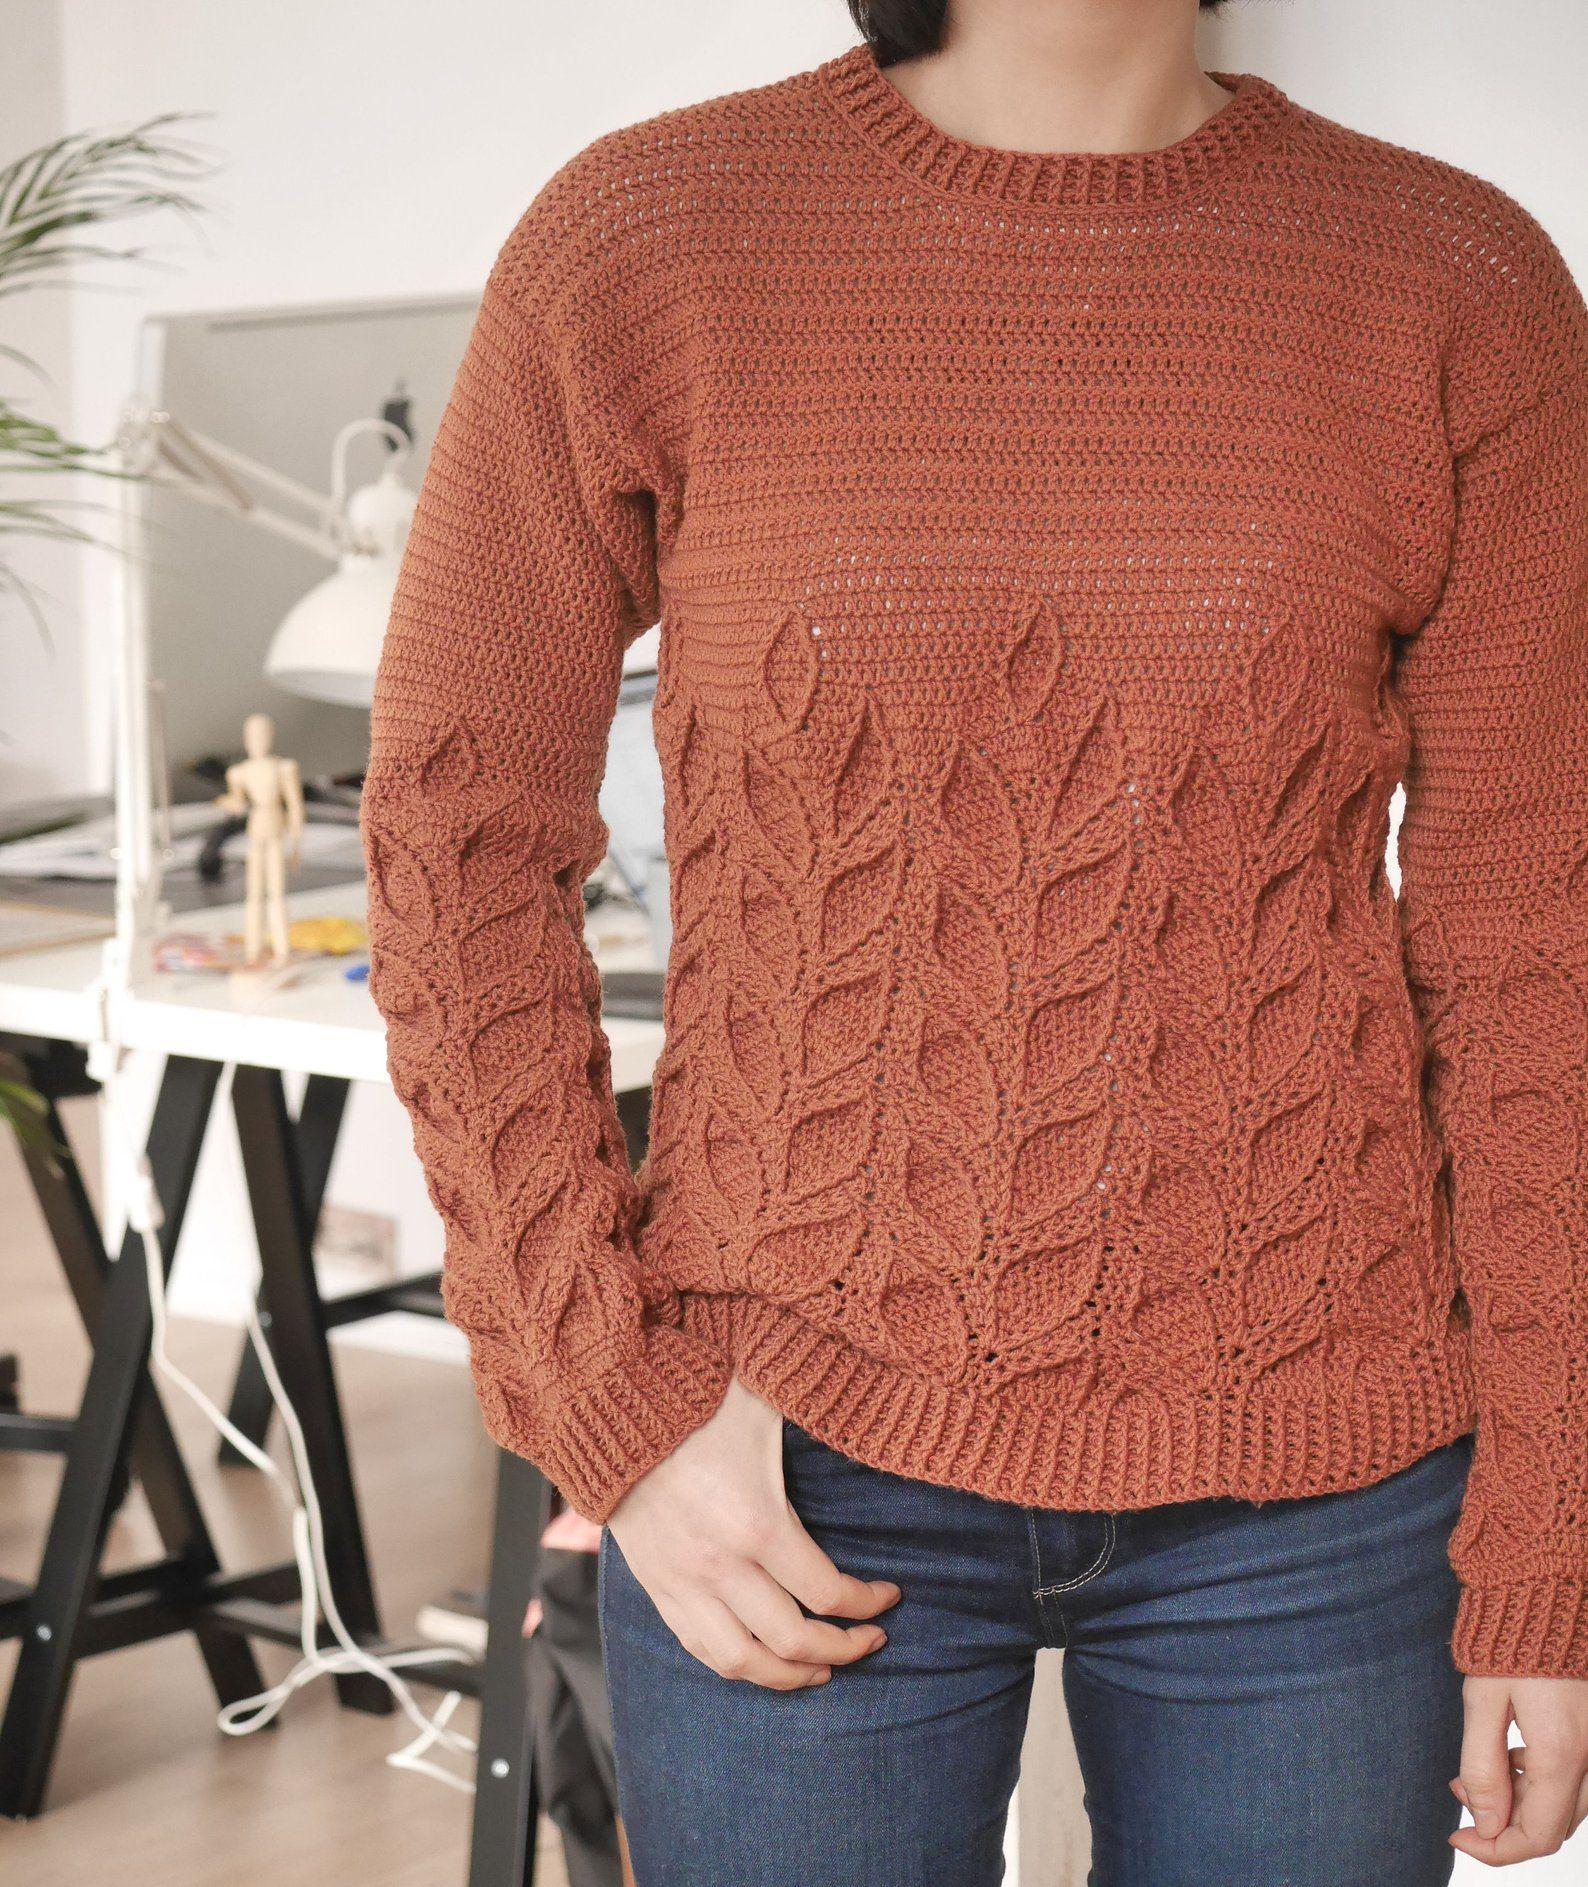 27dca6d1a931 Crochet Sweater Pattern PDF Lau Sweater crochet crew neck